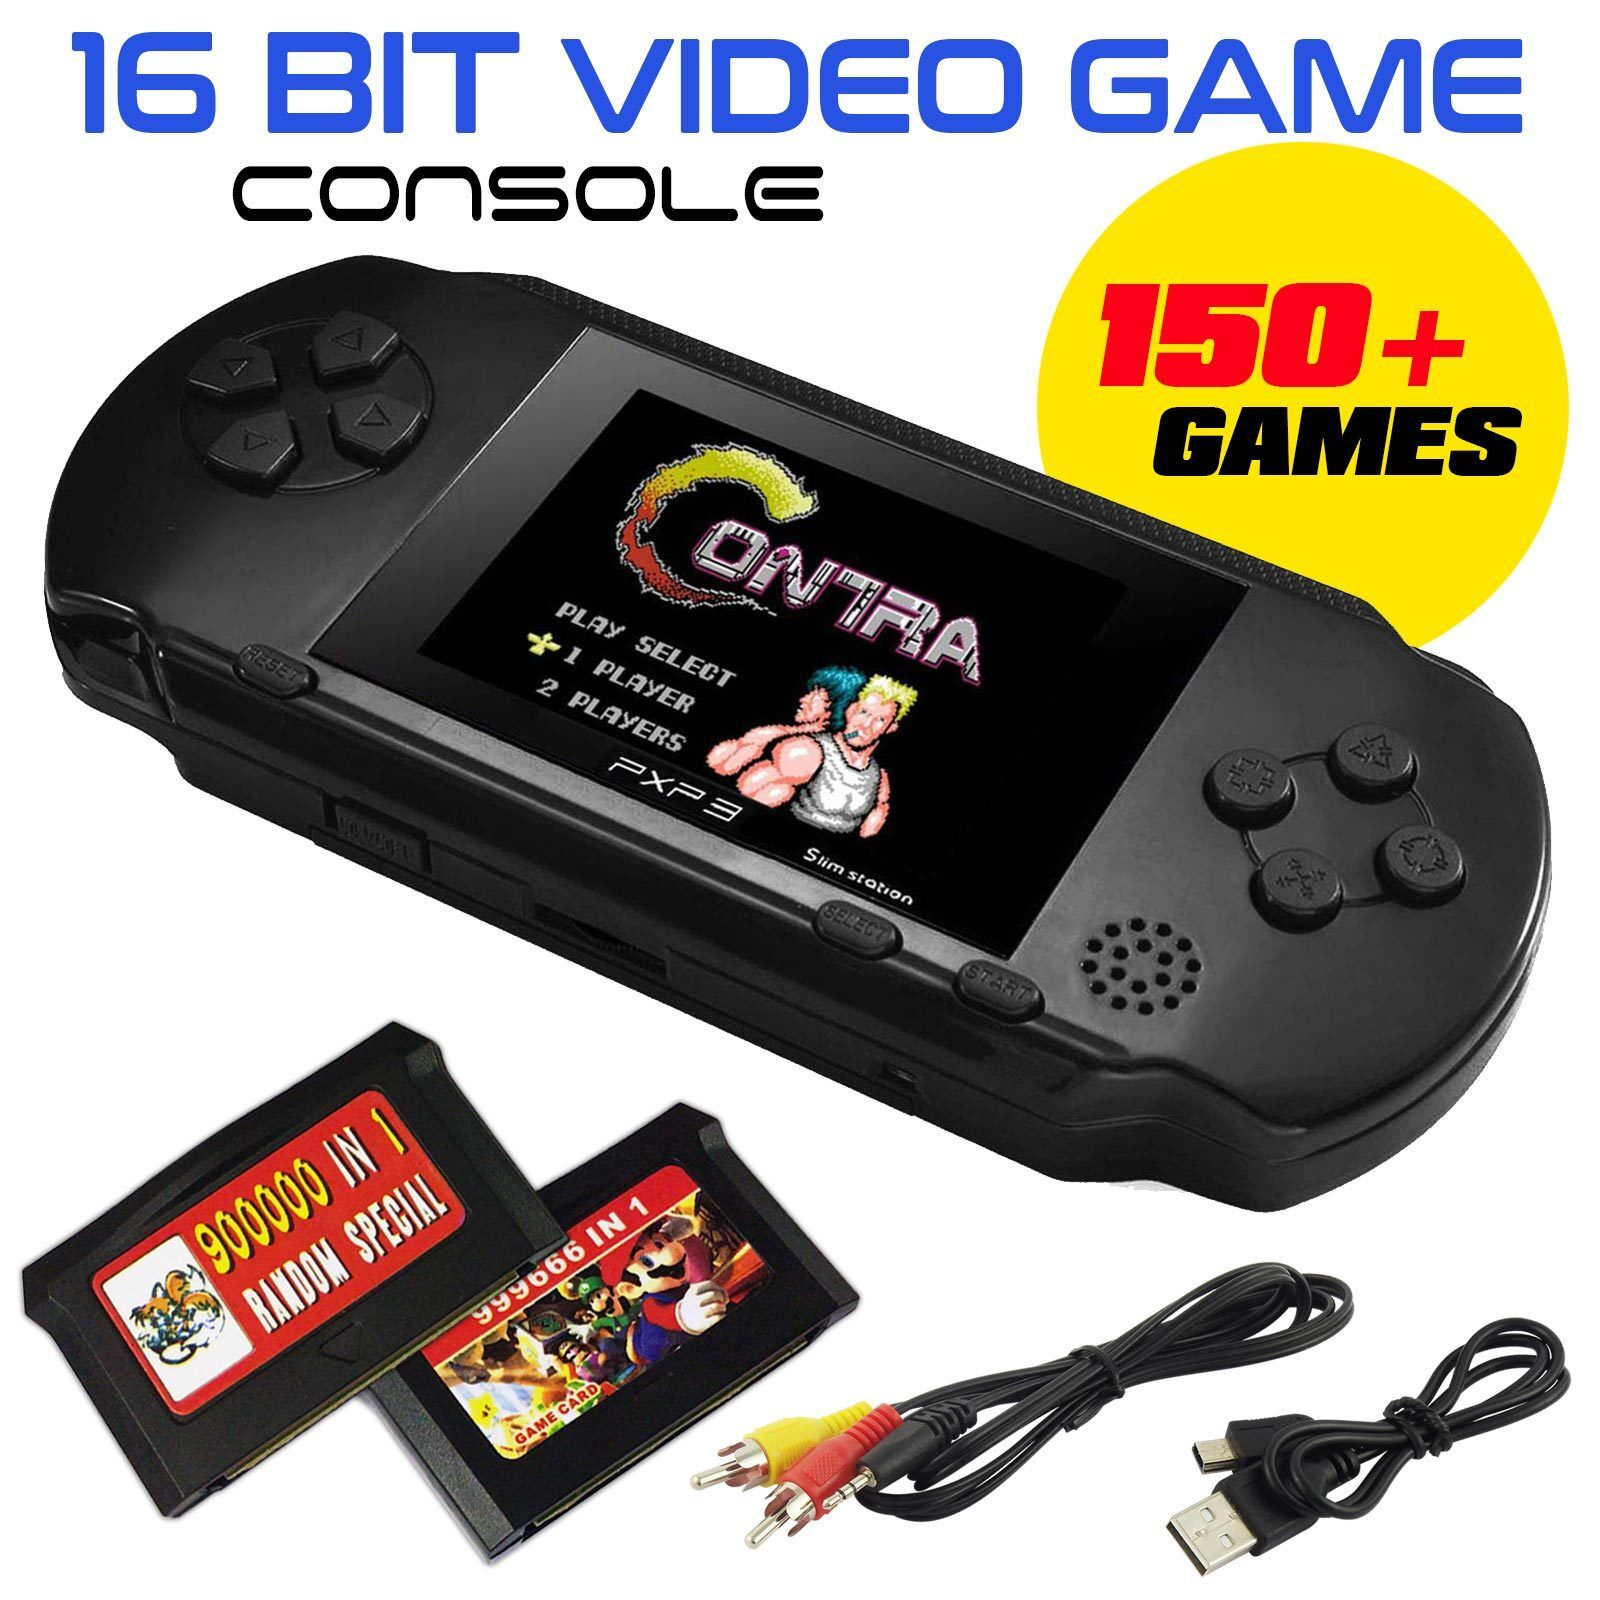 16 Bit PXP PVP tragbare Videospiel-Handkonsole 150 Spiele Retro Megadrive